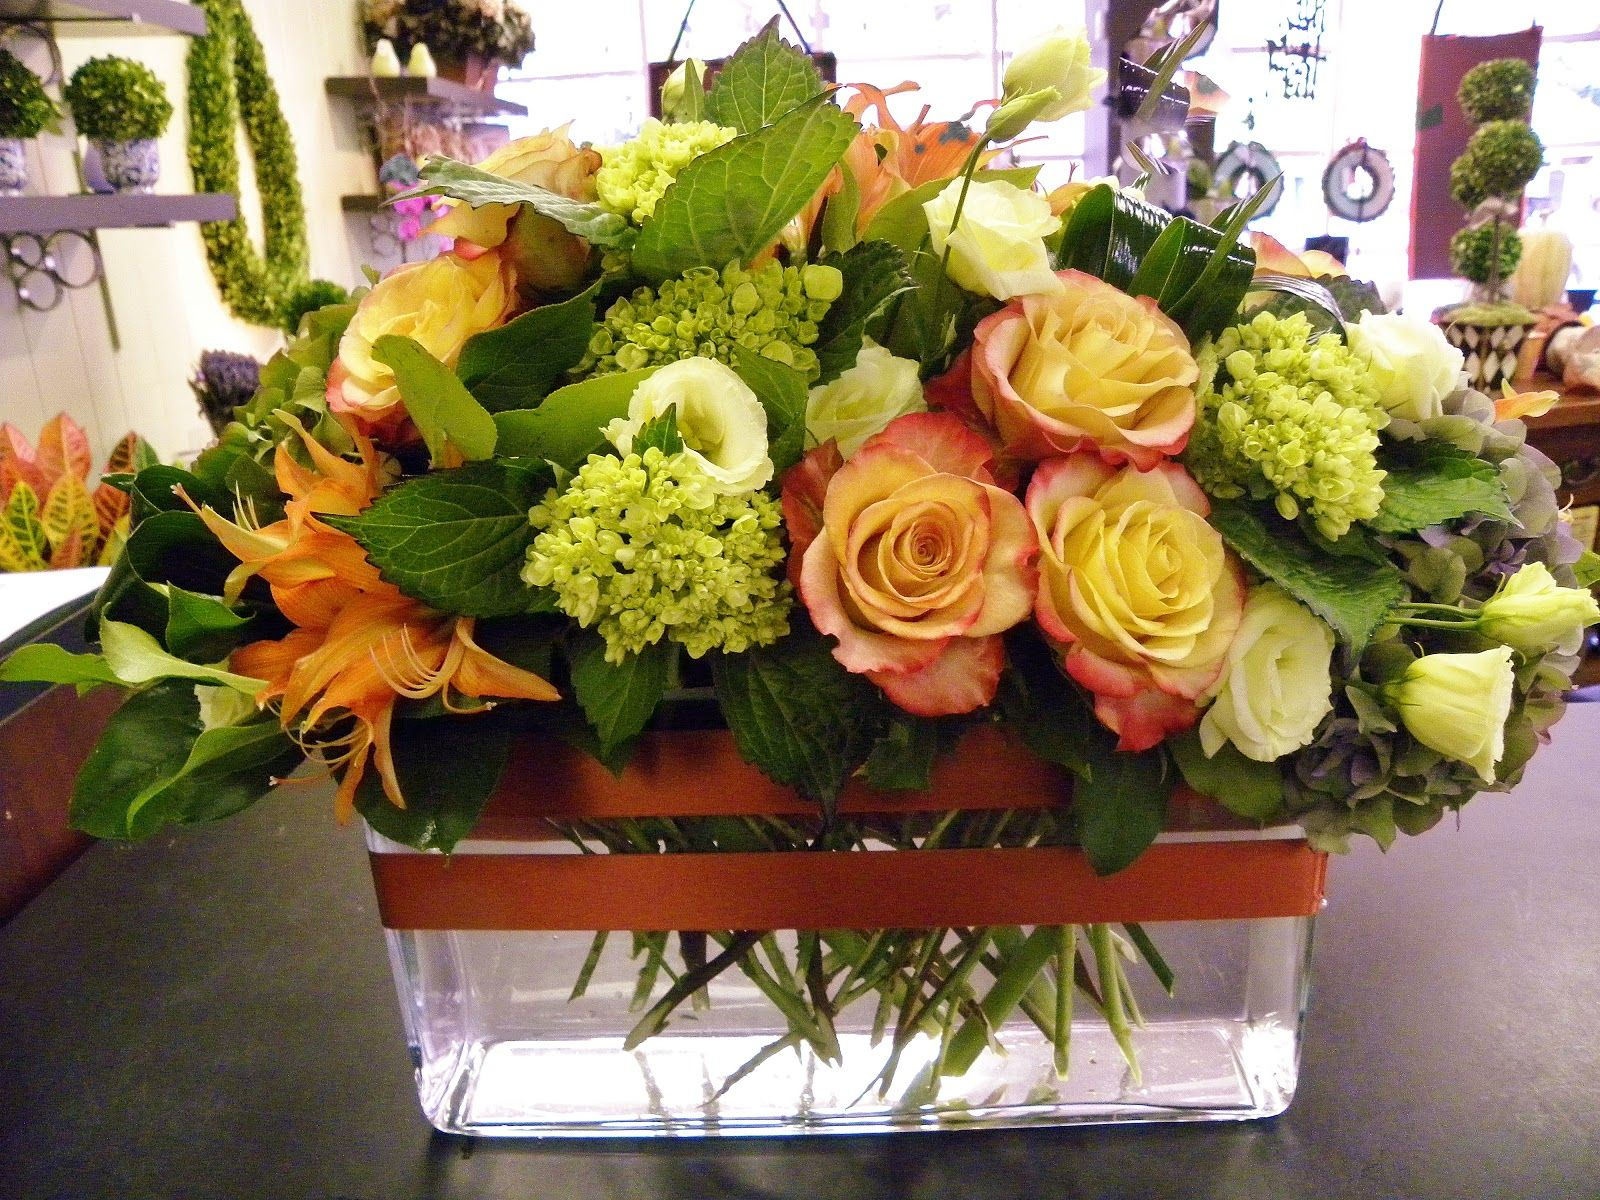 Helen Olivia Flowers Dining Room Centerpiece Dining Room Centerpiece Rectangle Wedding Tables Flower Arrangements Simple